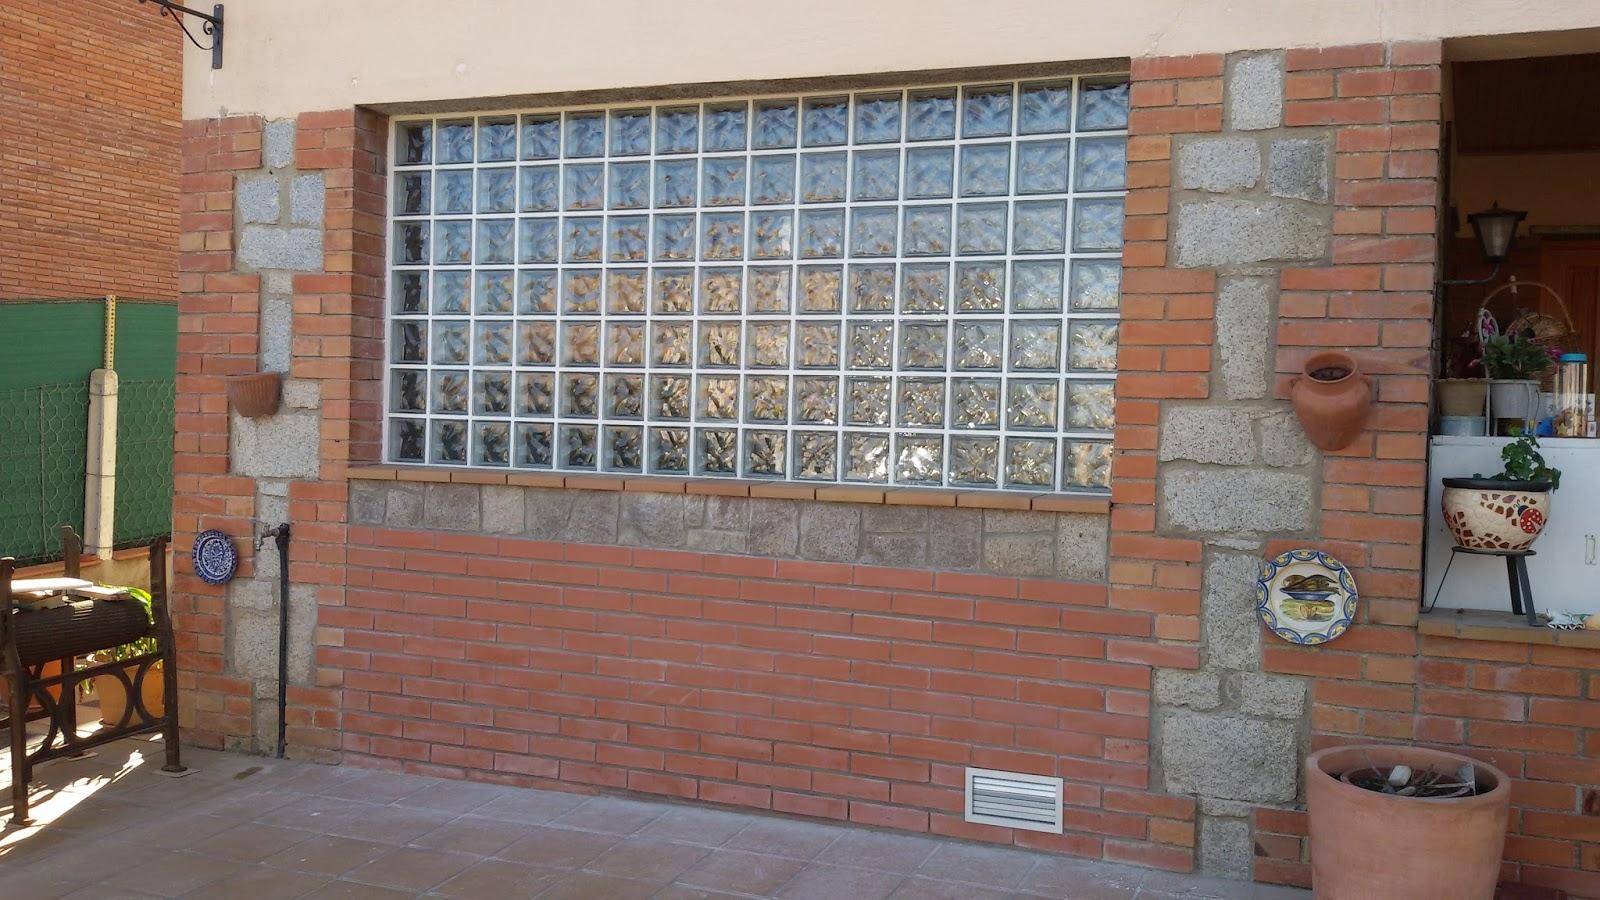 Bloques de vidrio paves precios cheap bloque de vidrio - Bloques de paves ...